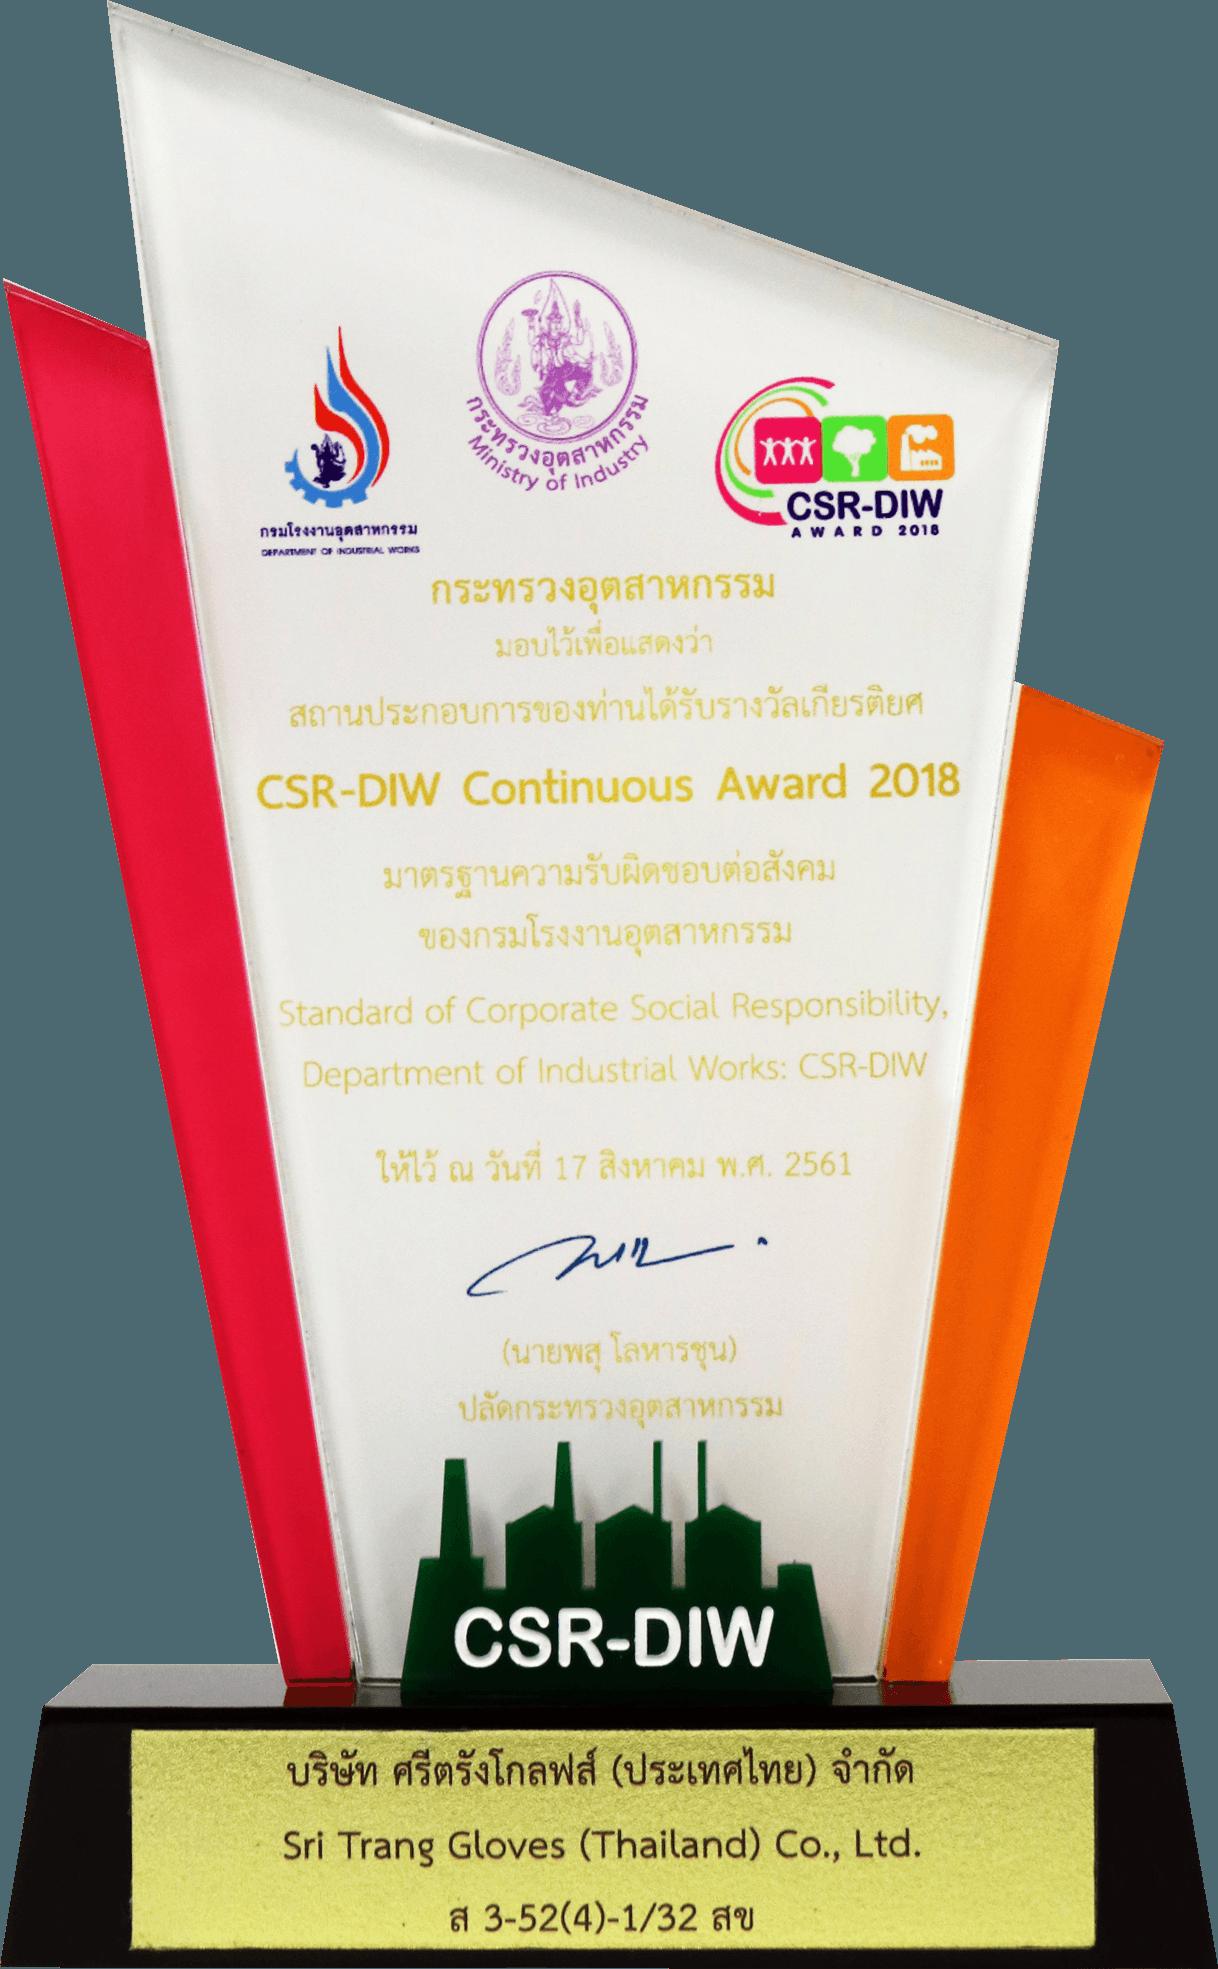 2018 CSR-DIW Continuous Award